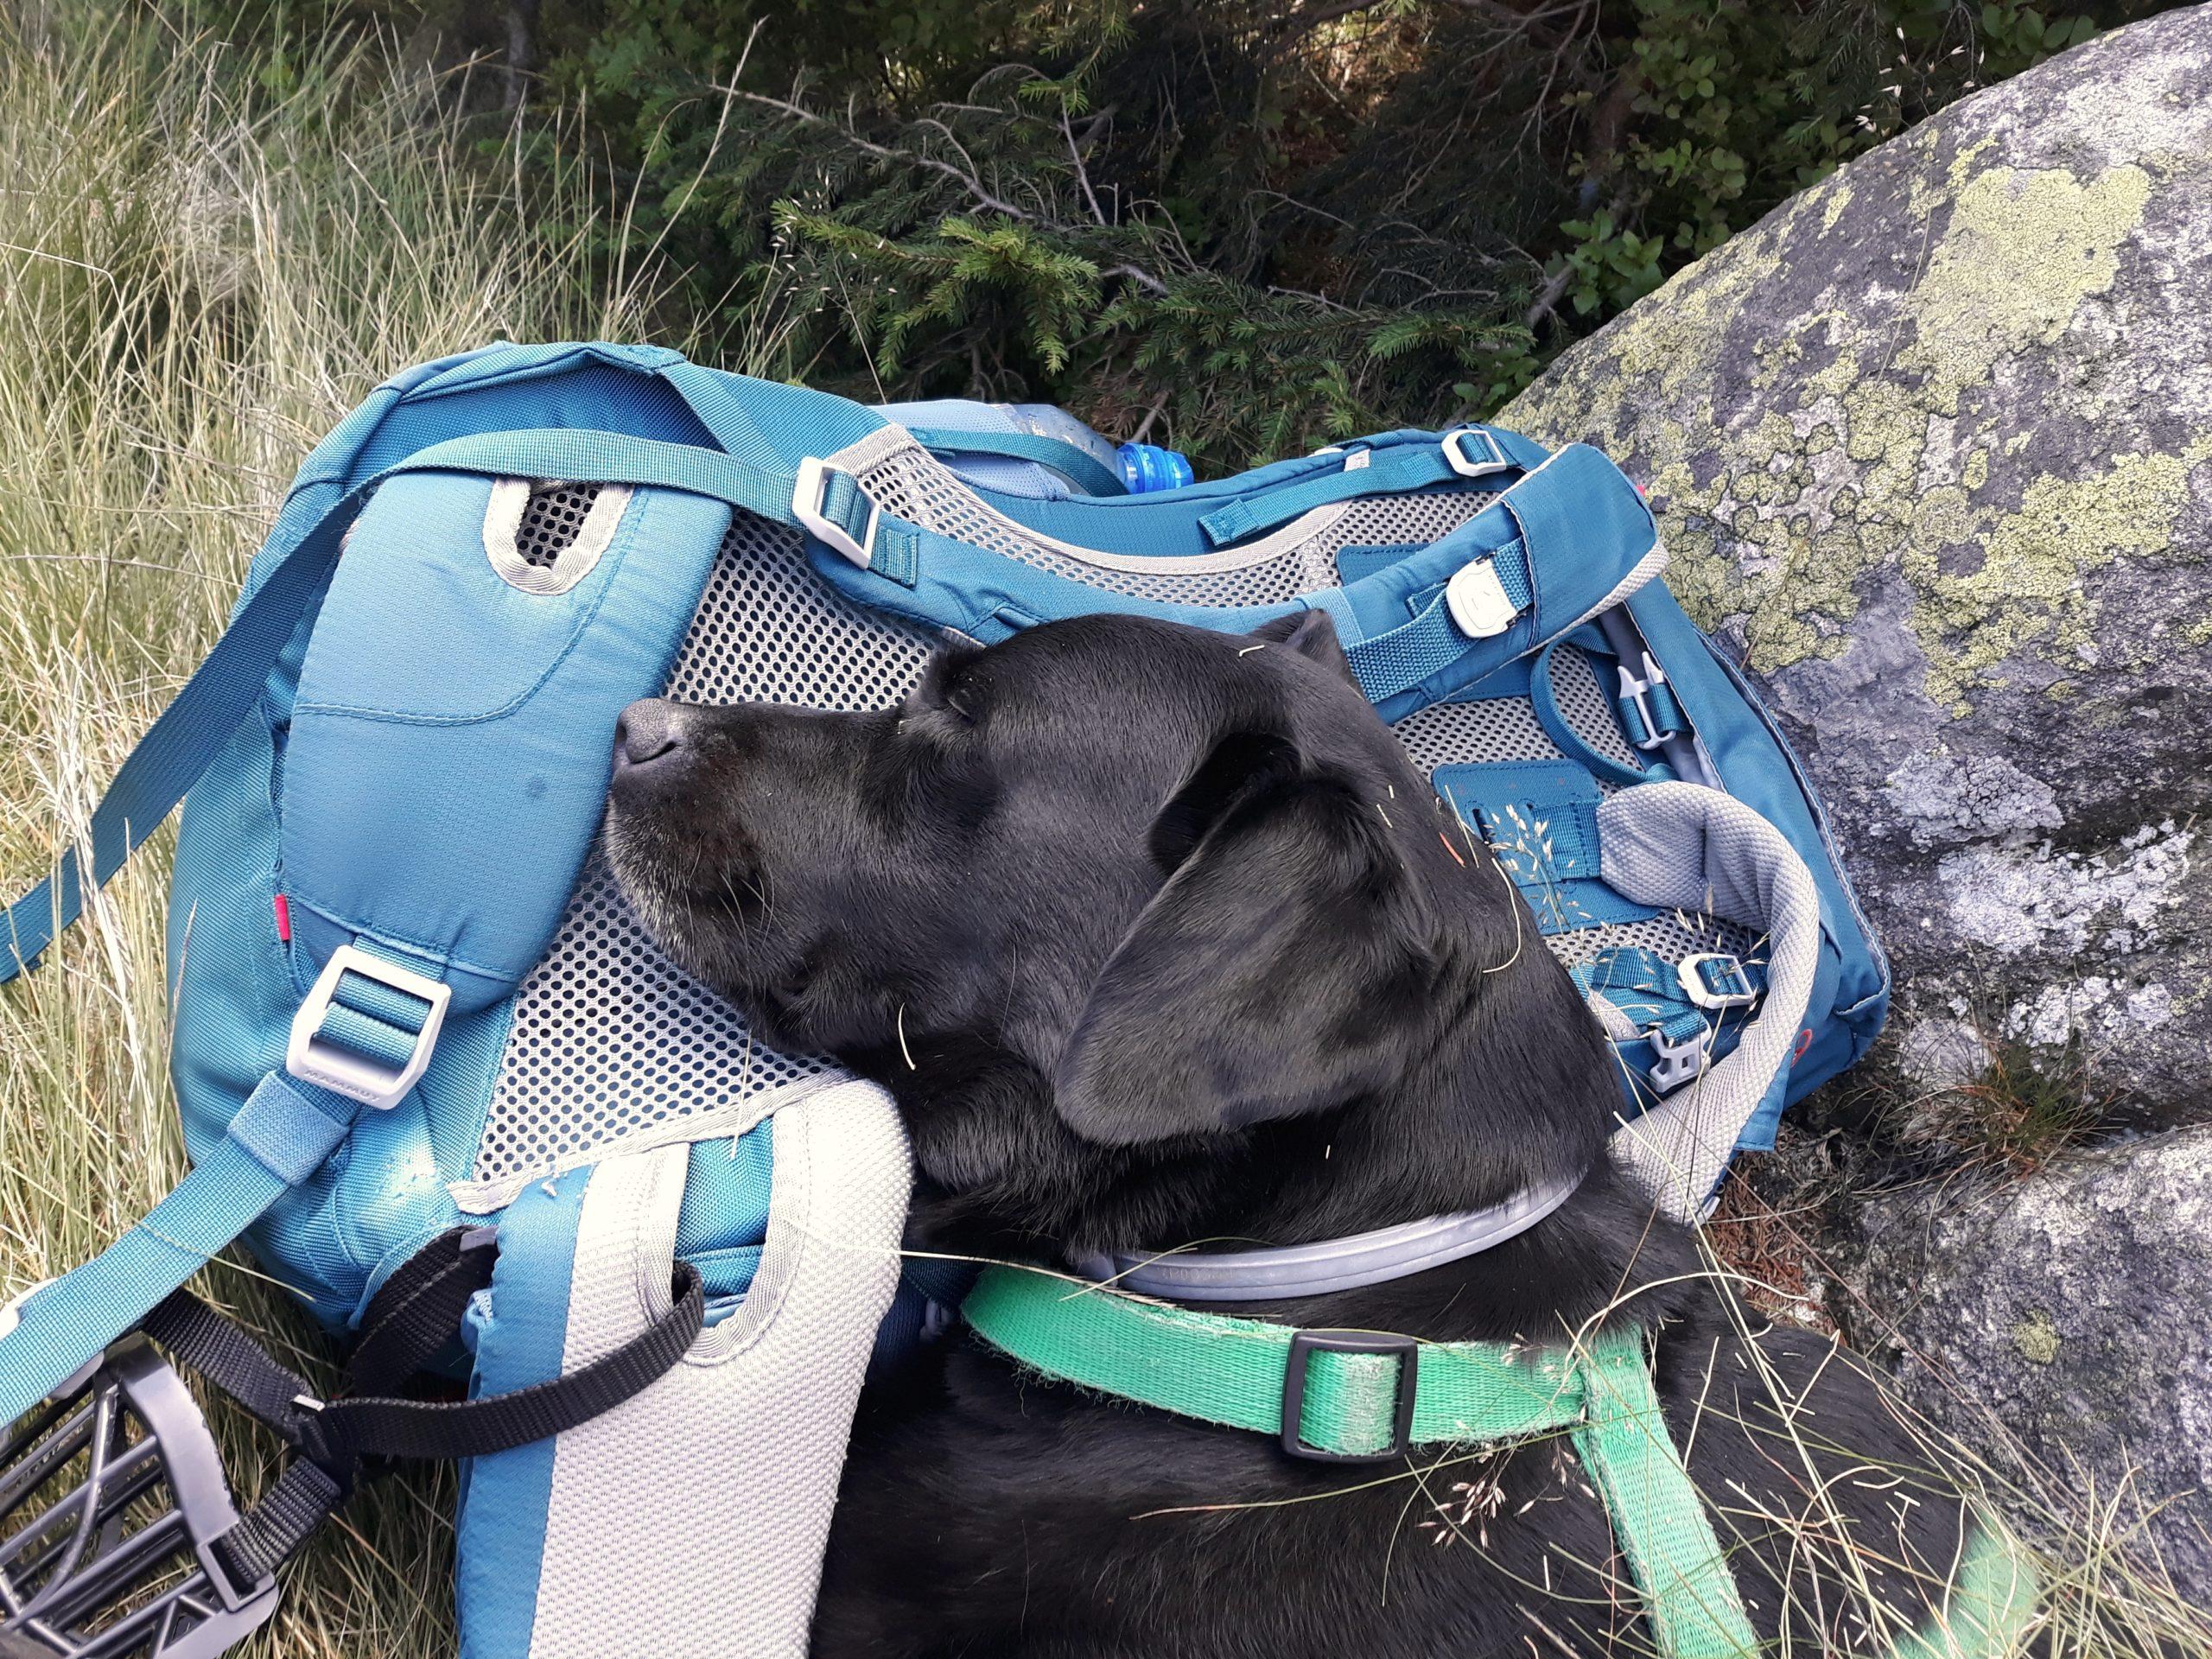 spanie z psem w górach